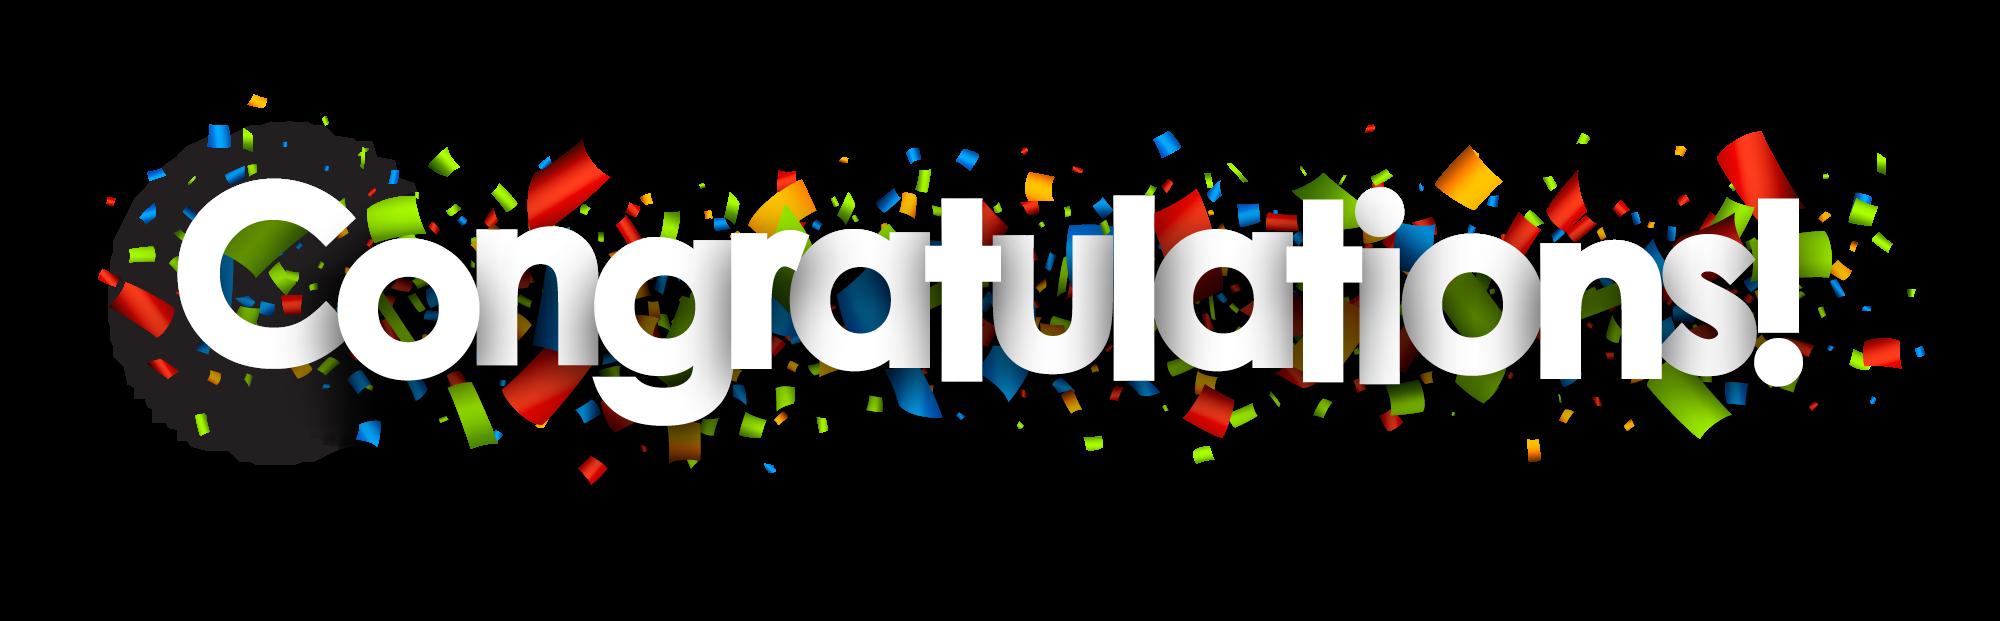 Congratulations clipart promotion congratulation.